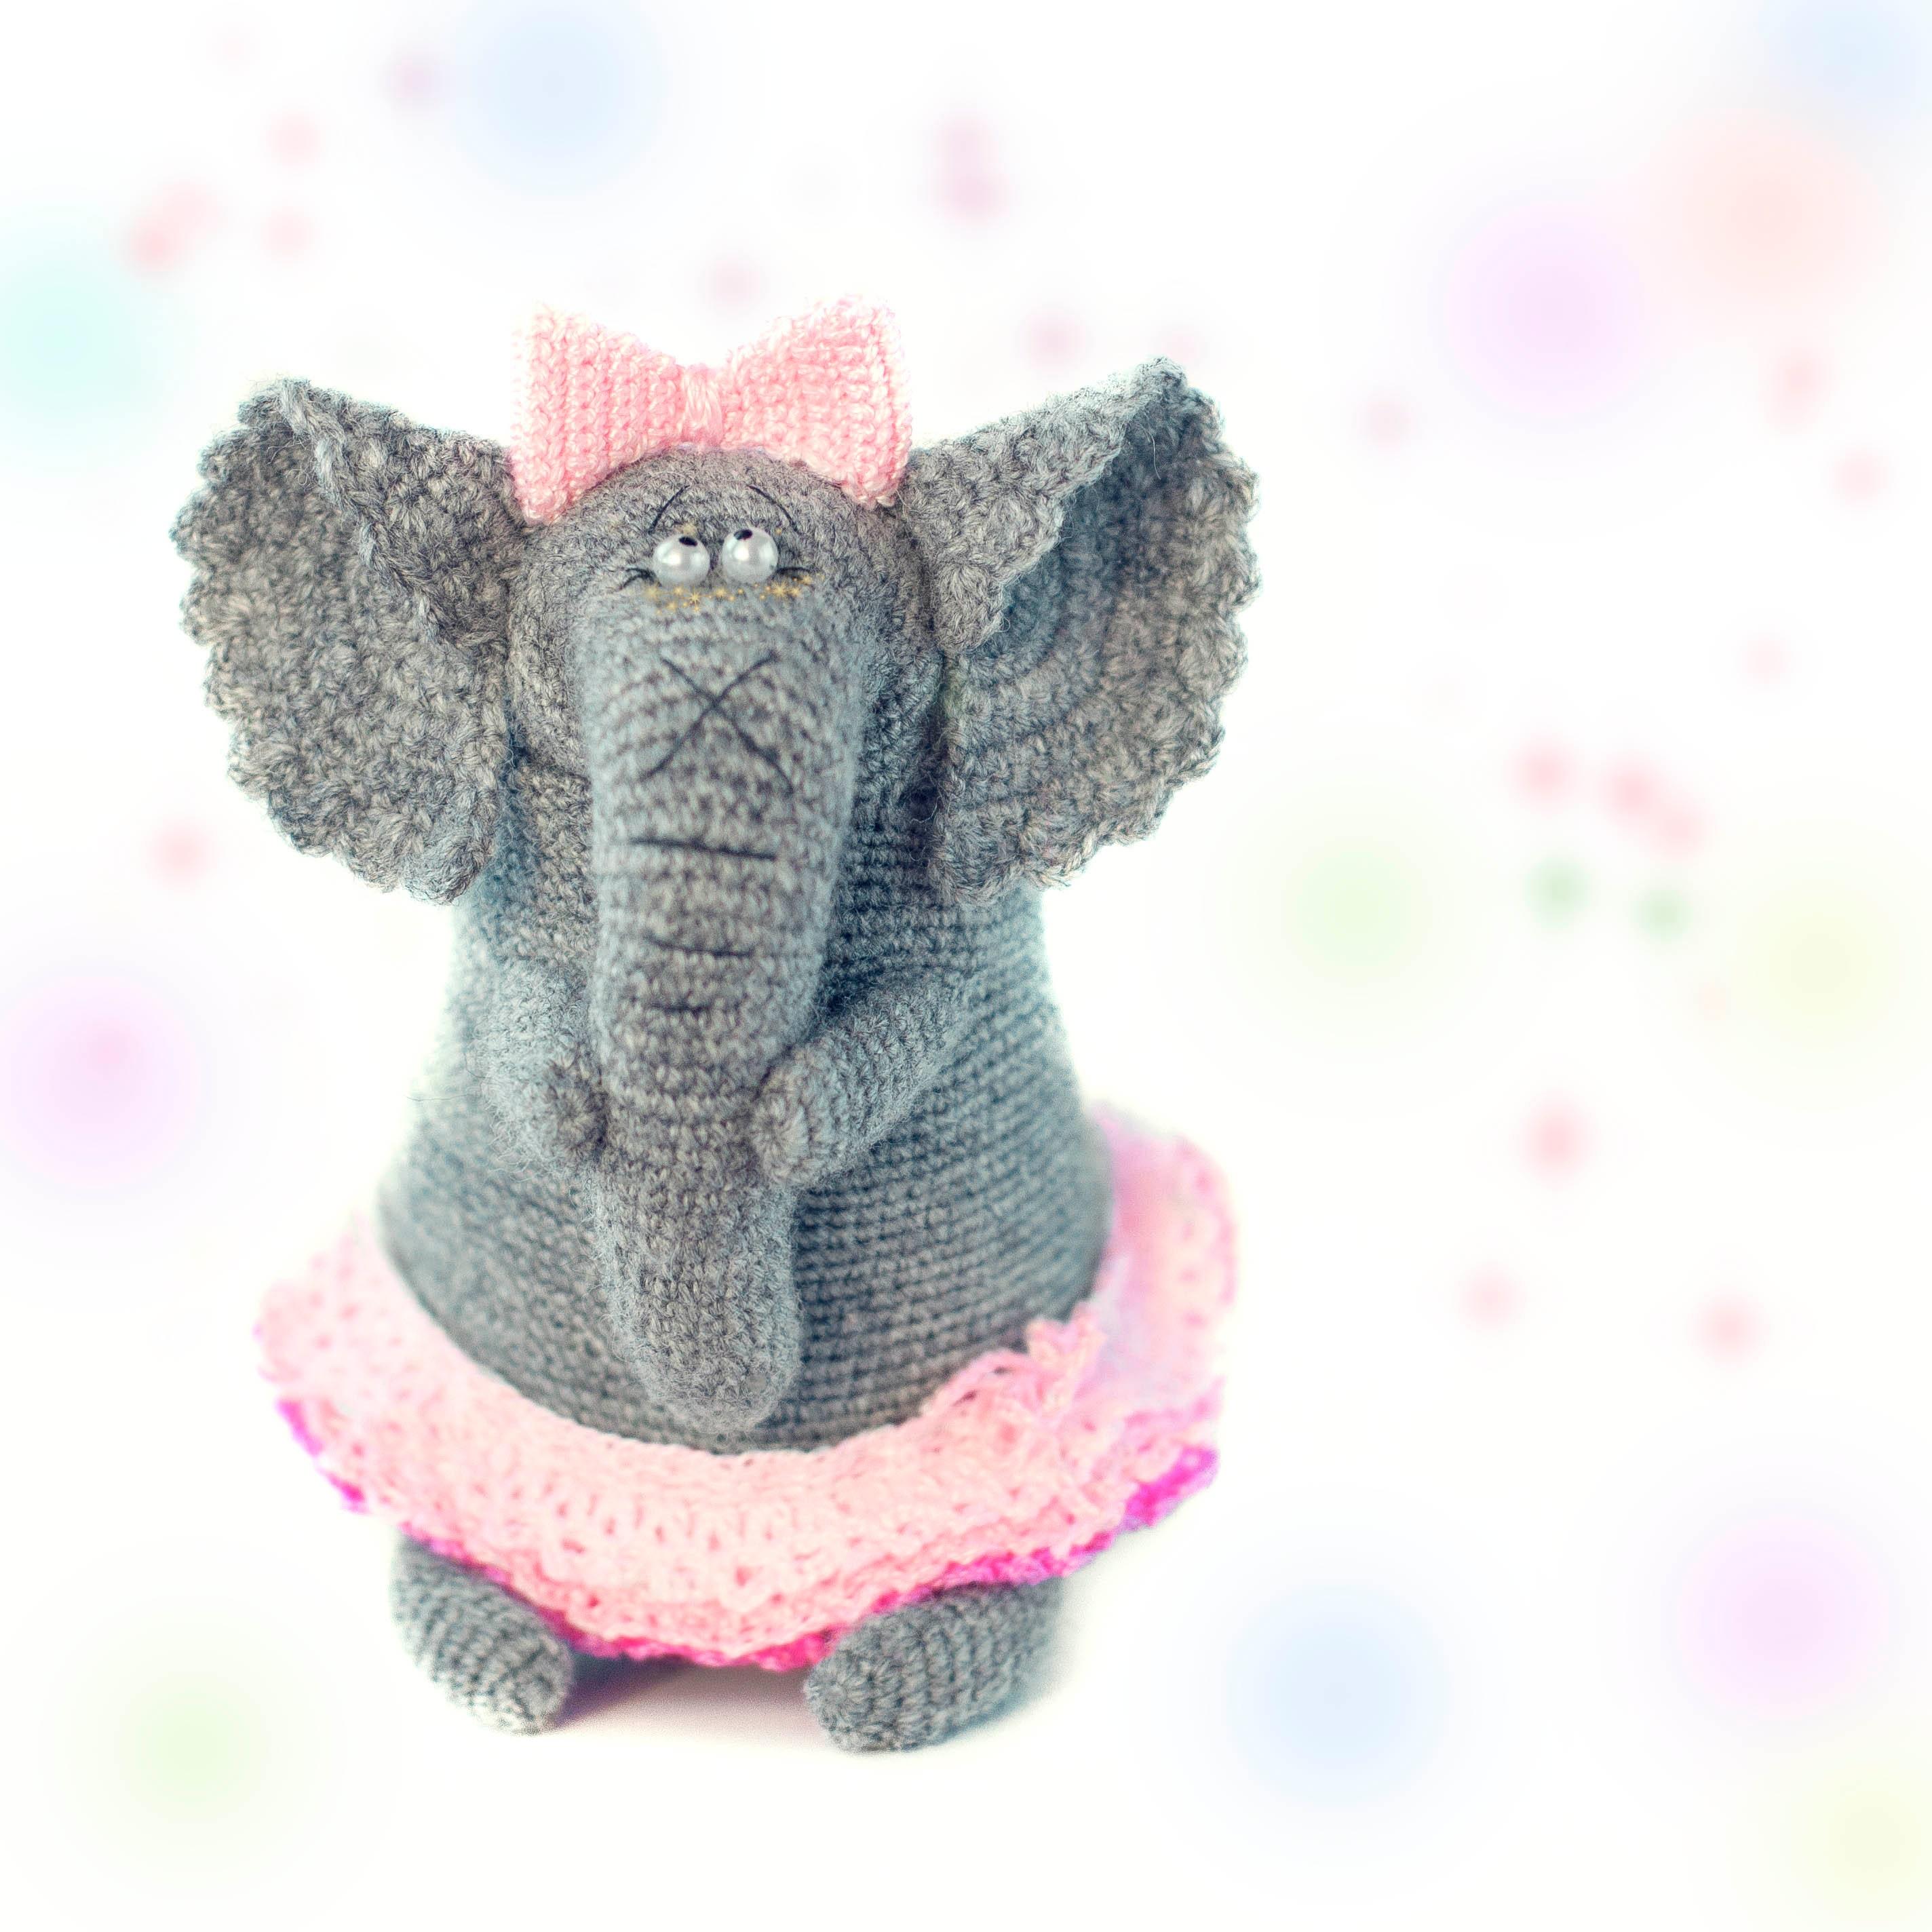 Amigurumi Crochet Elephant Pattern   Supergurumi   2848x2848